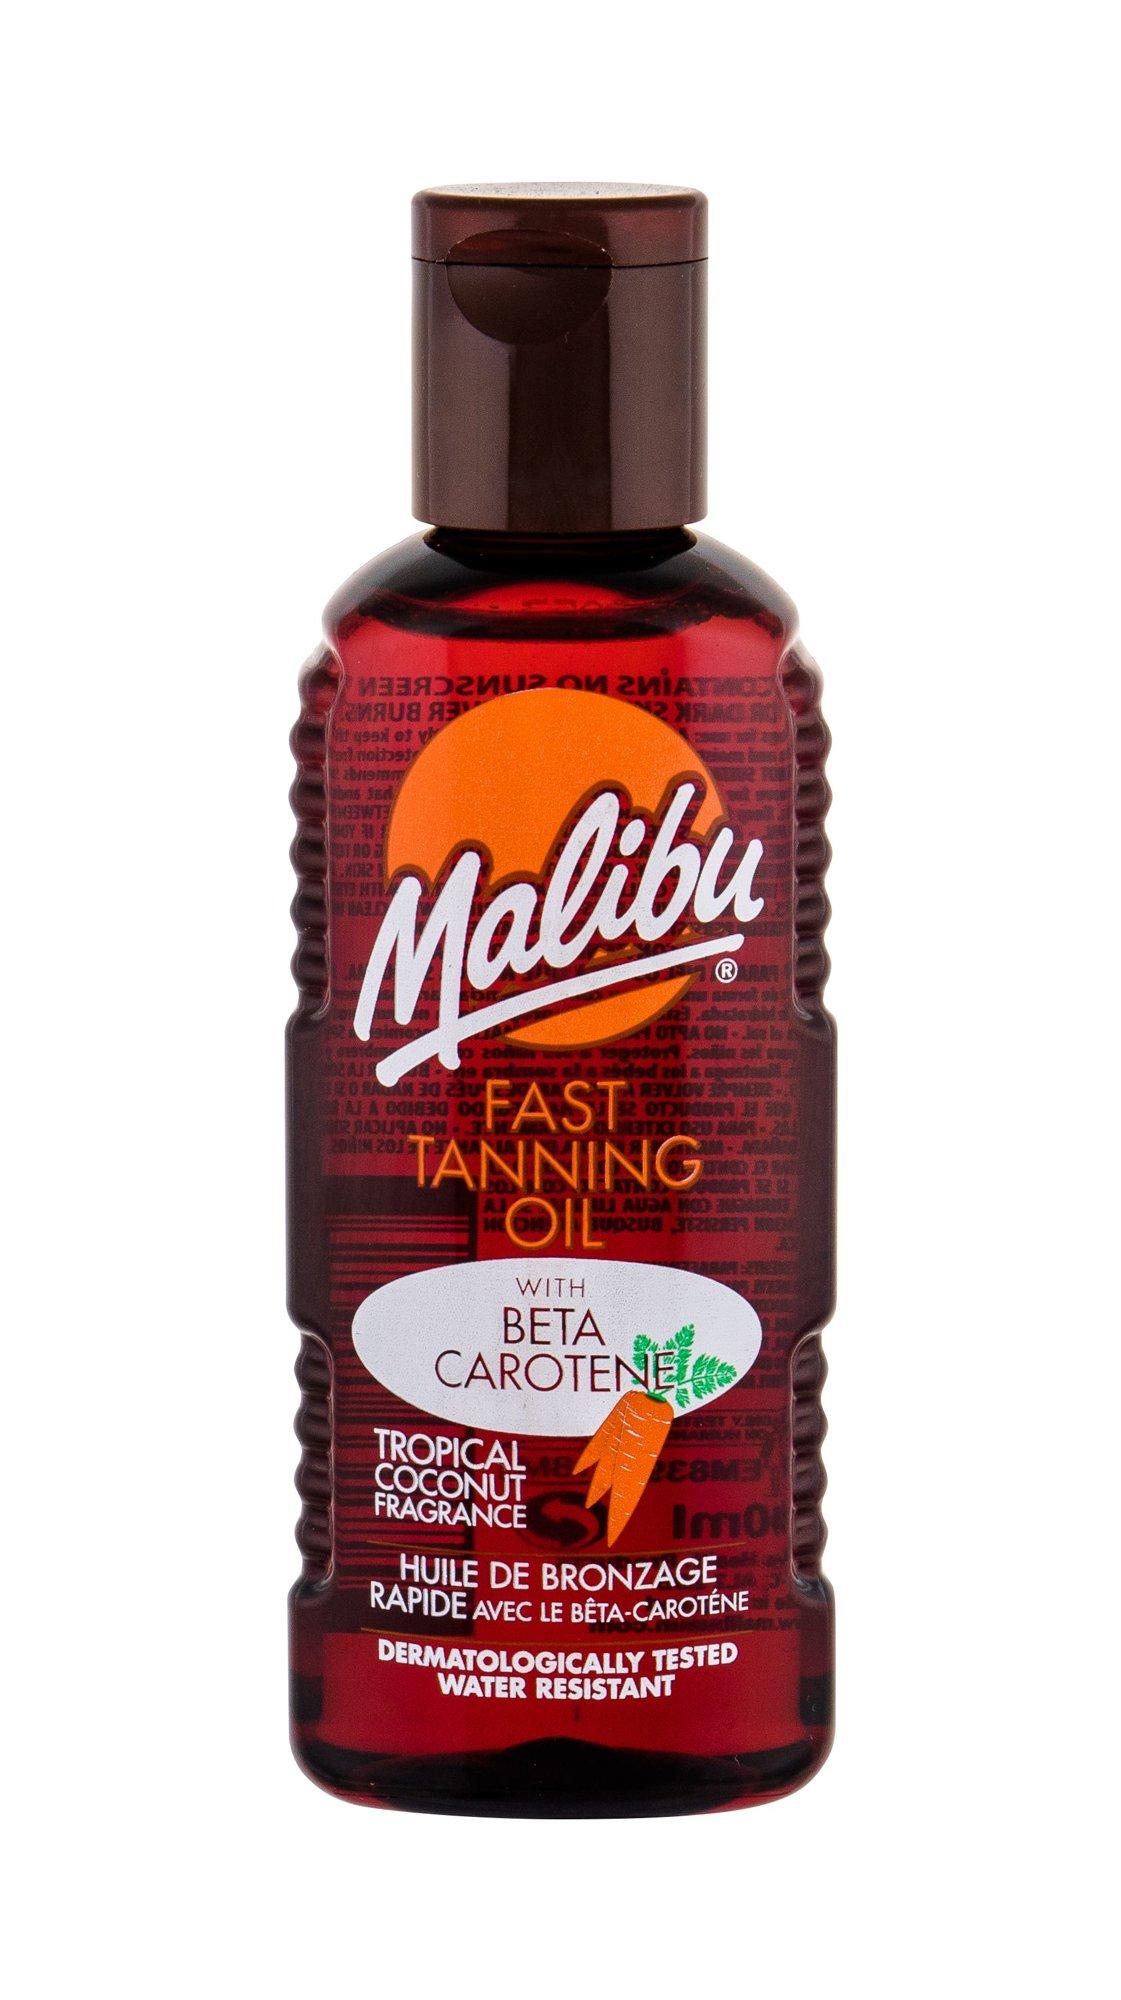 Malibu Fast Tanning Oil Sun Body Lotion 100ml